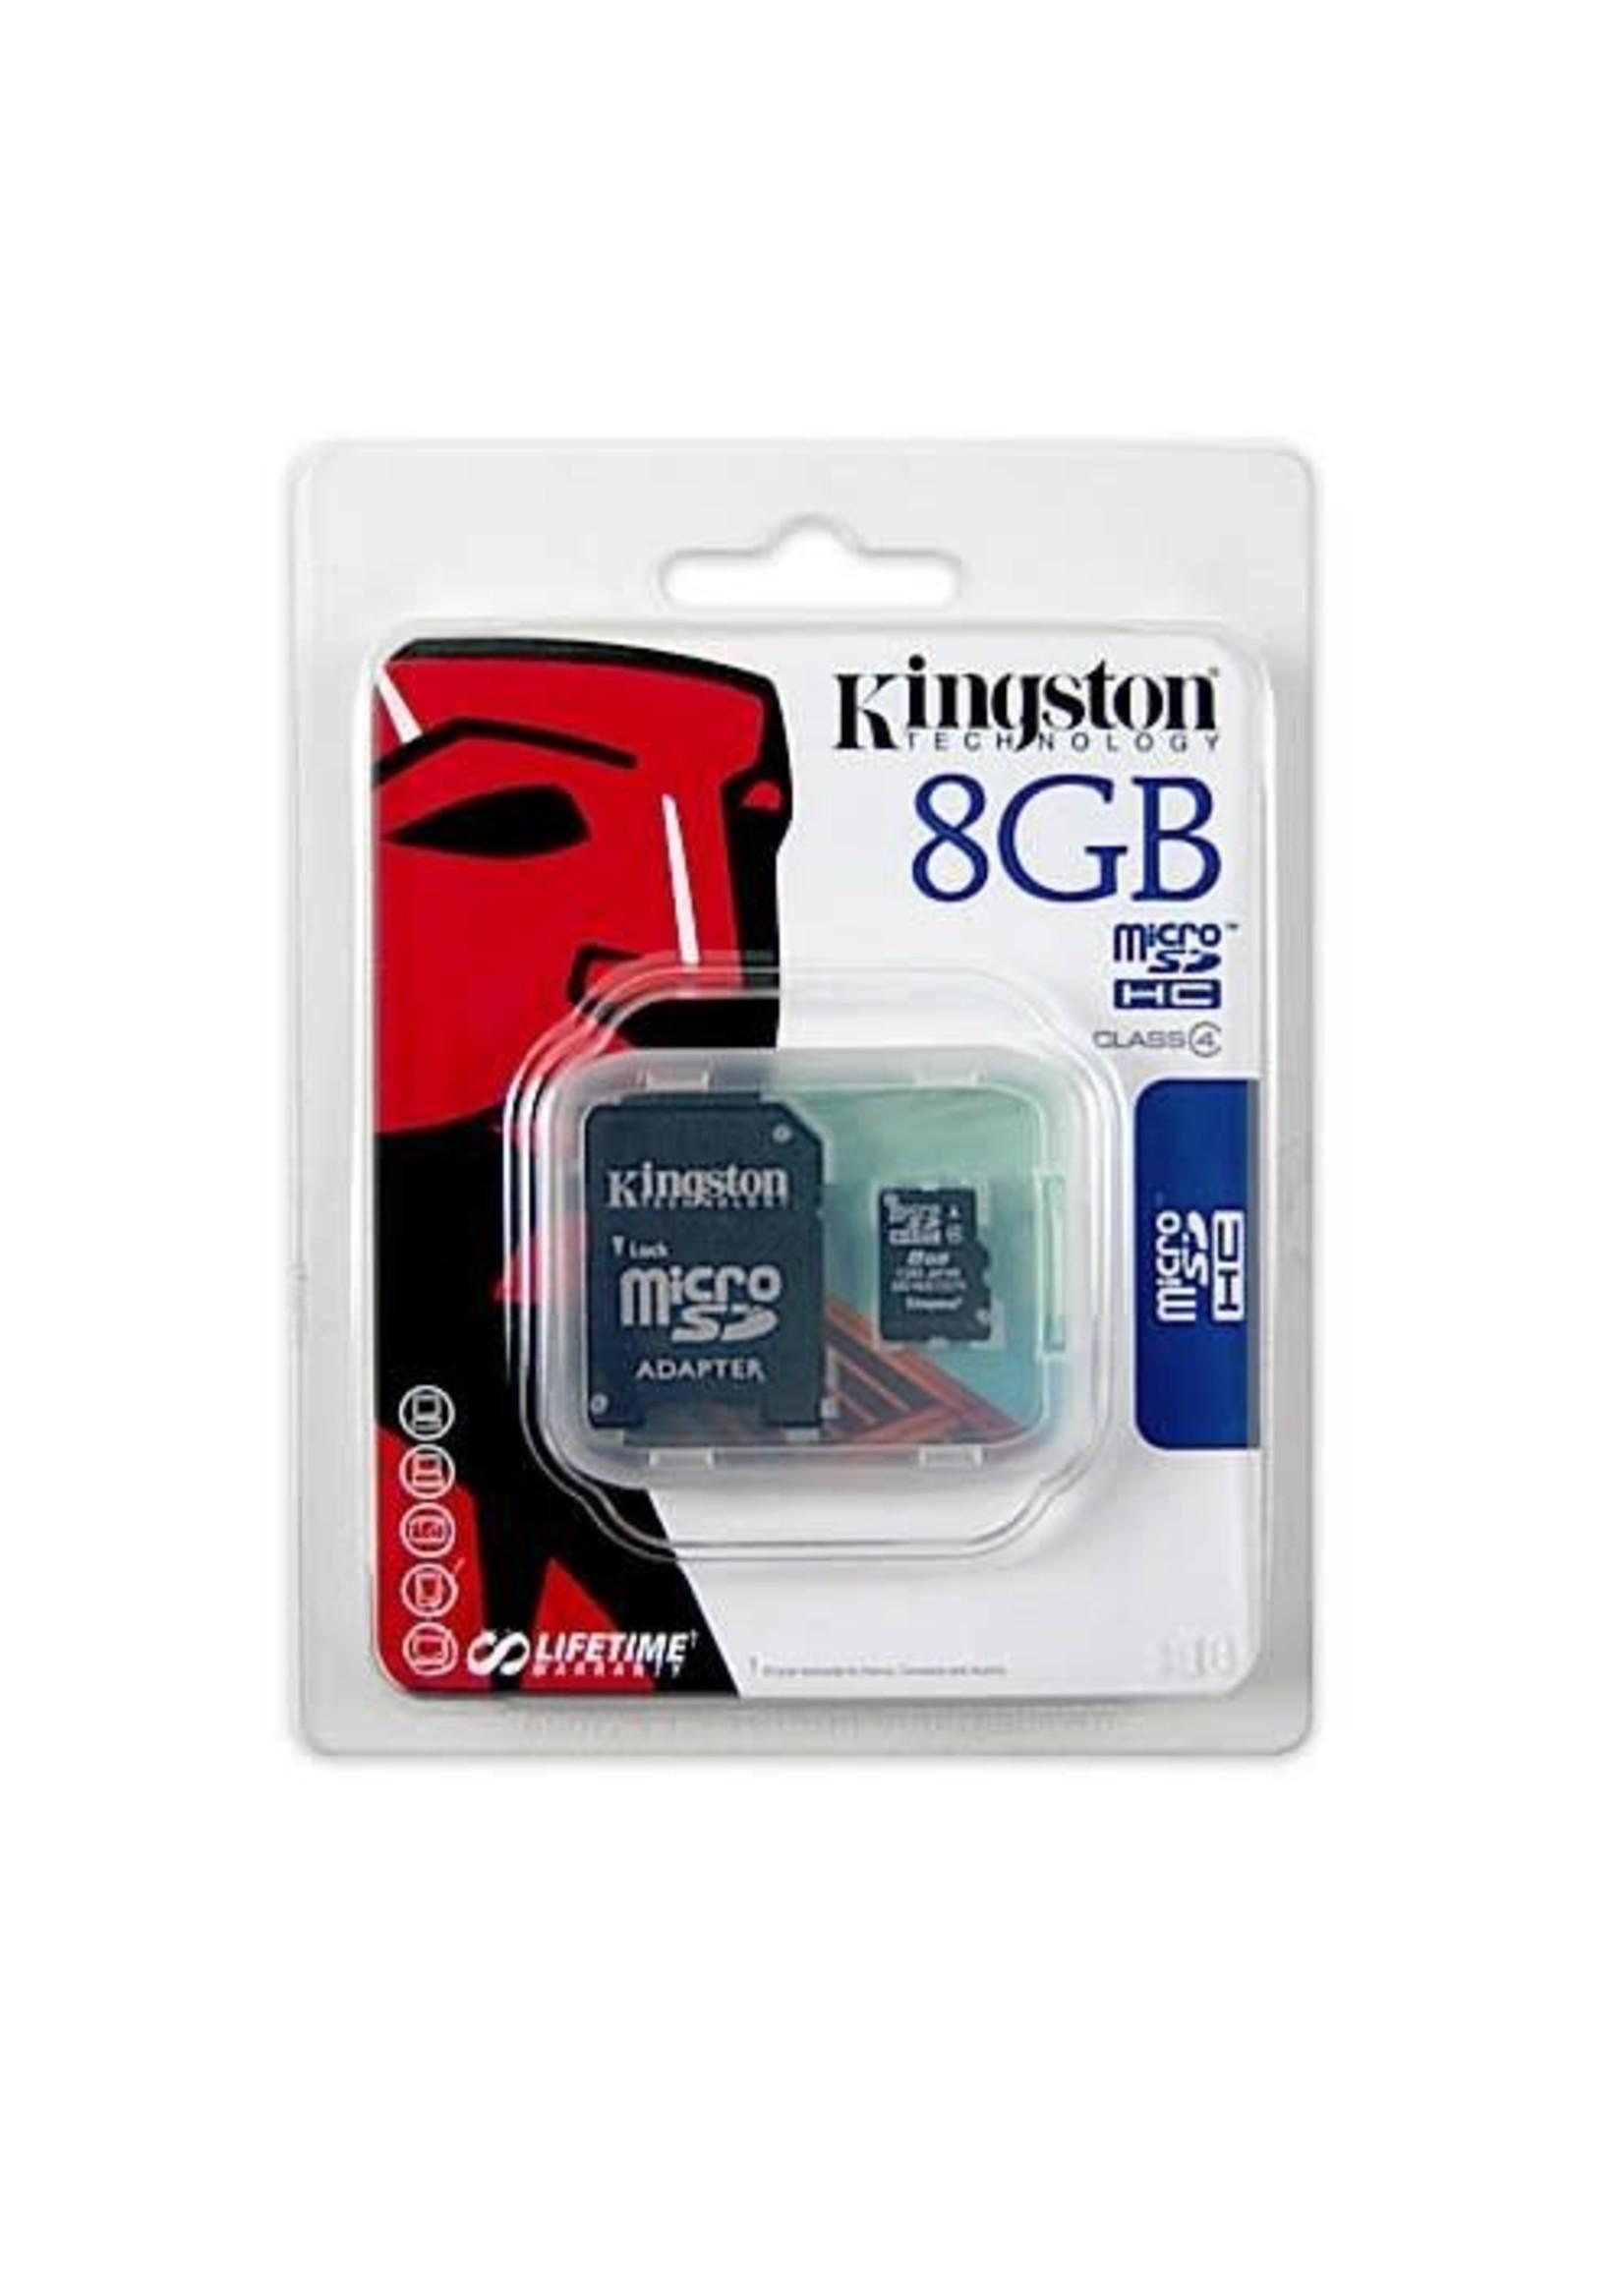 8GB Micro SD Memory Card